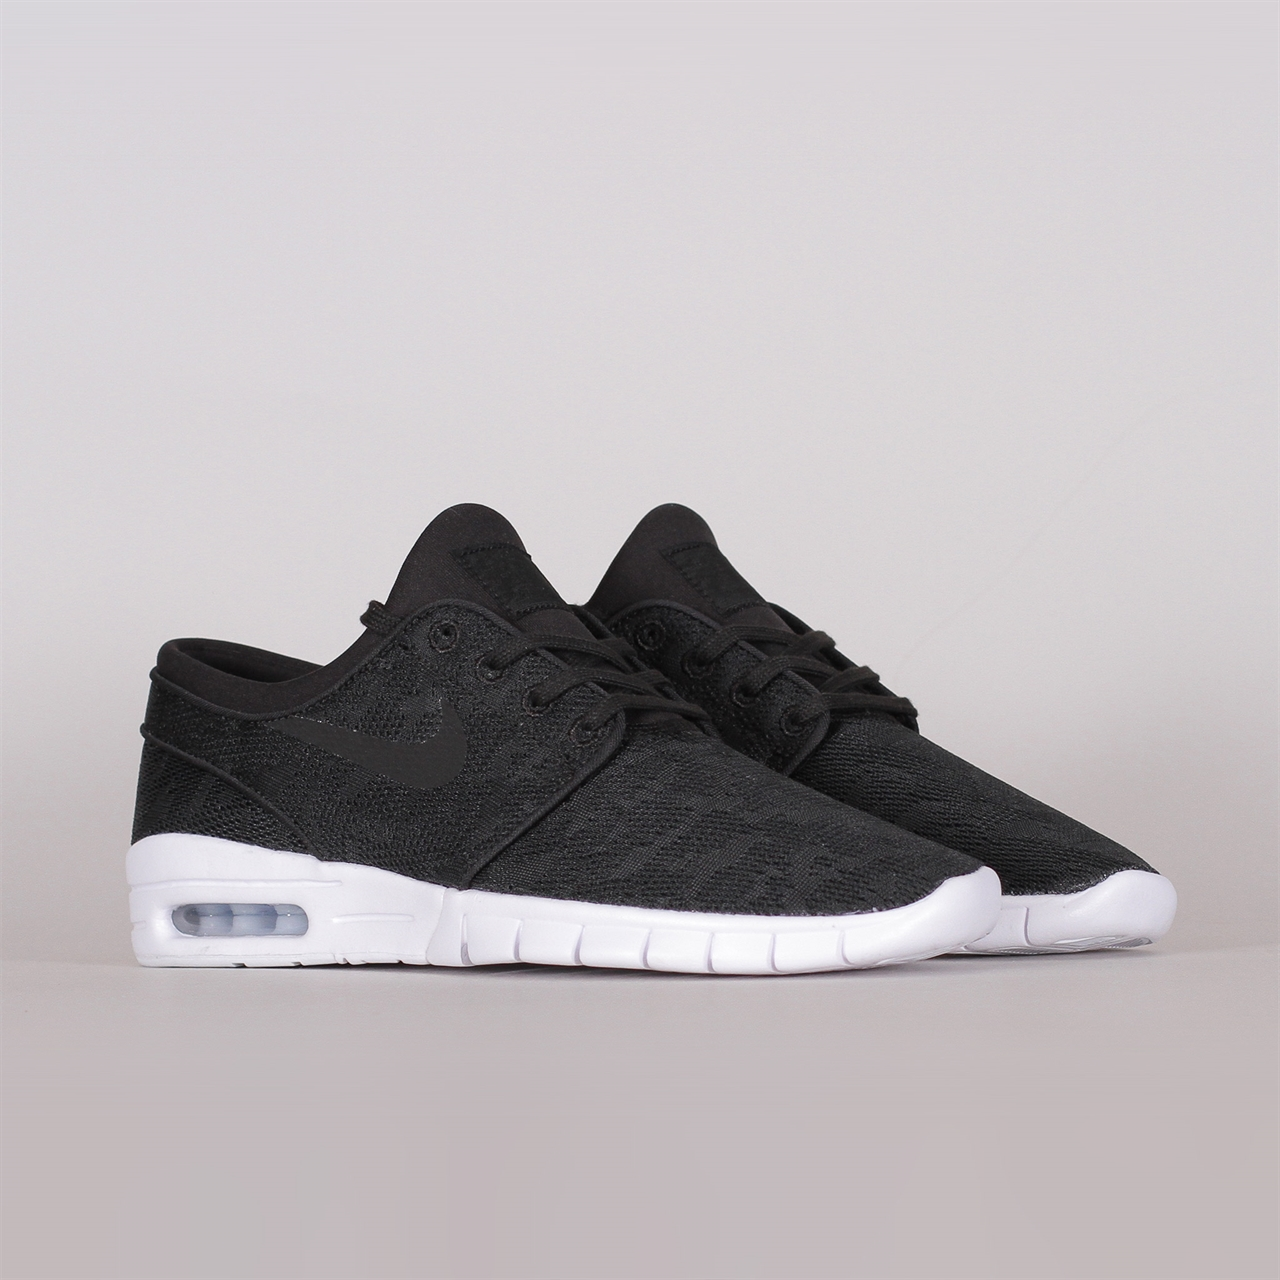 36e85234f202 Shelta - Nike SB Stefan Janoski Max (631303-022)